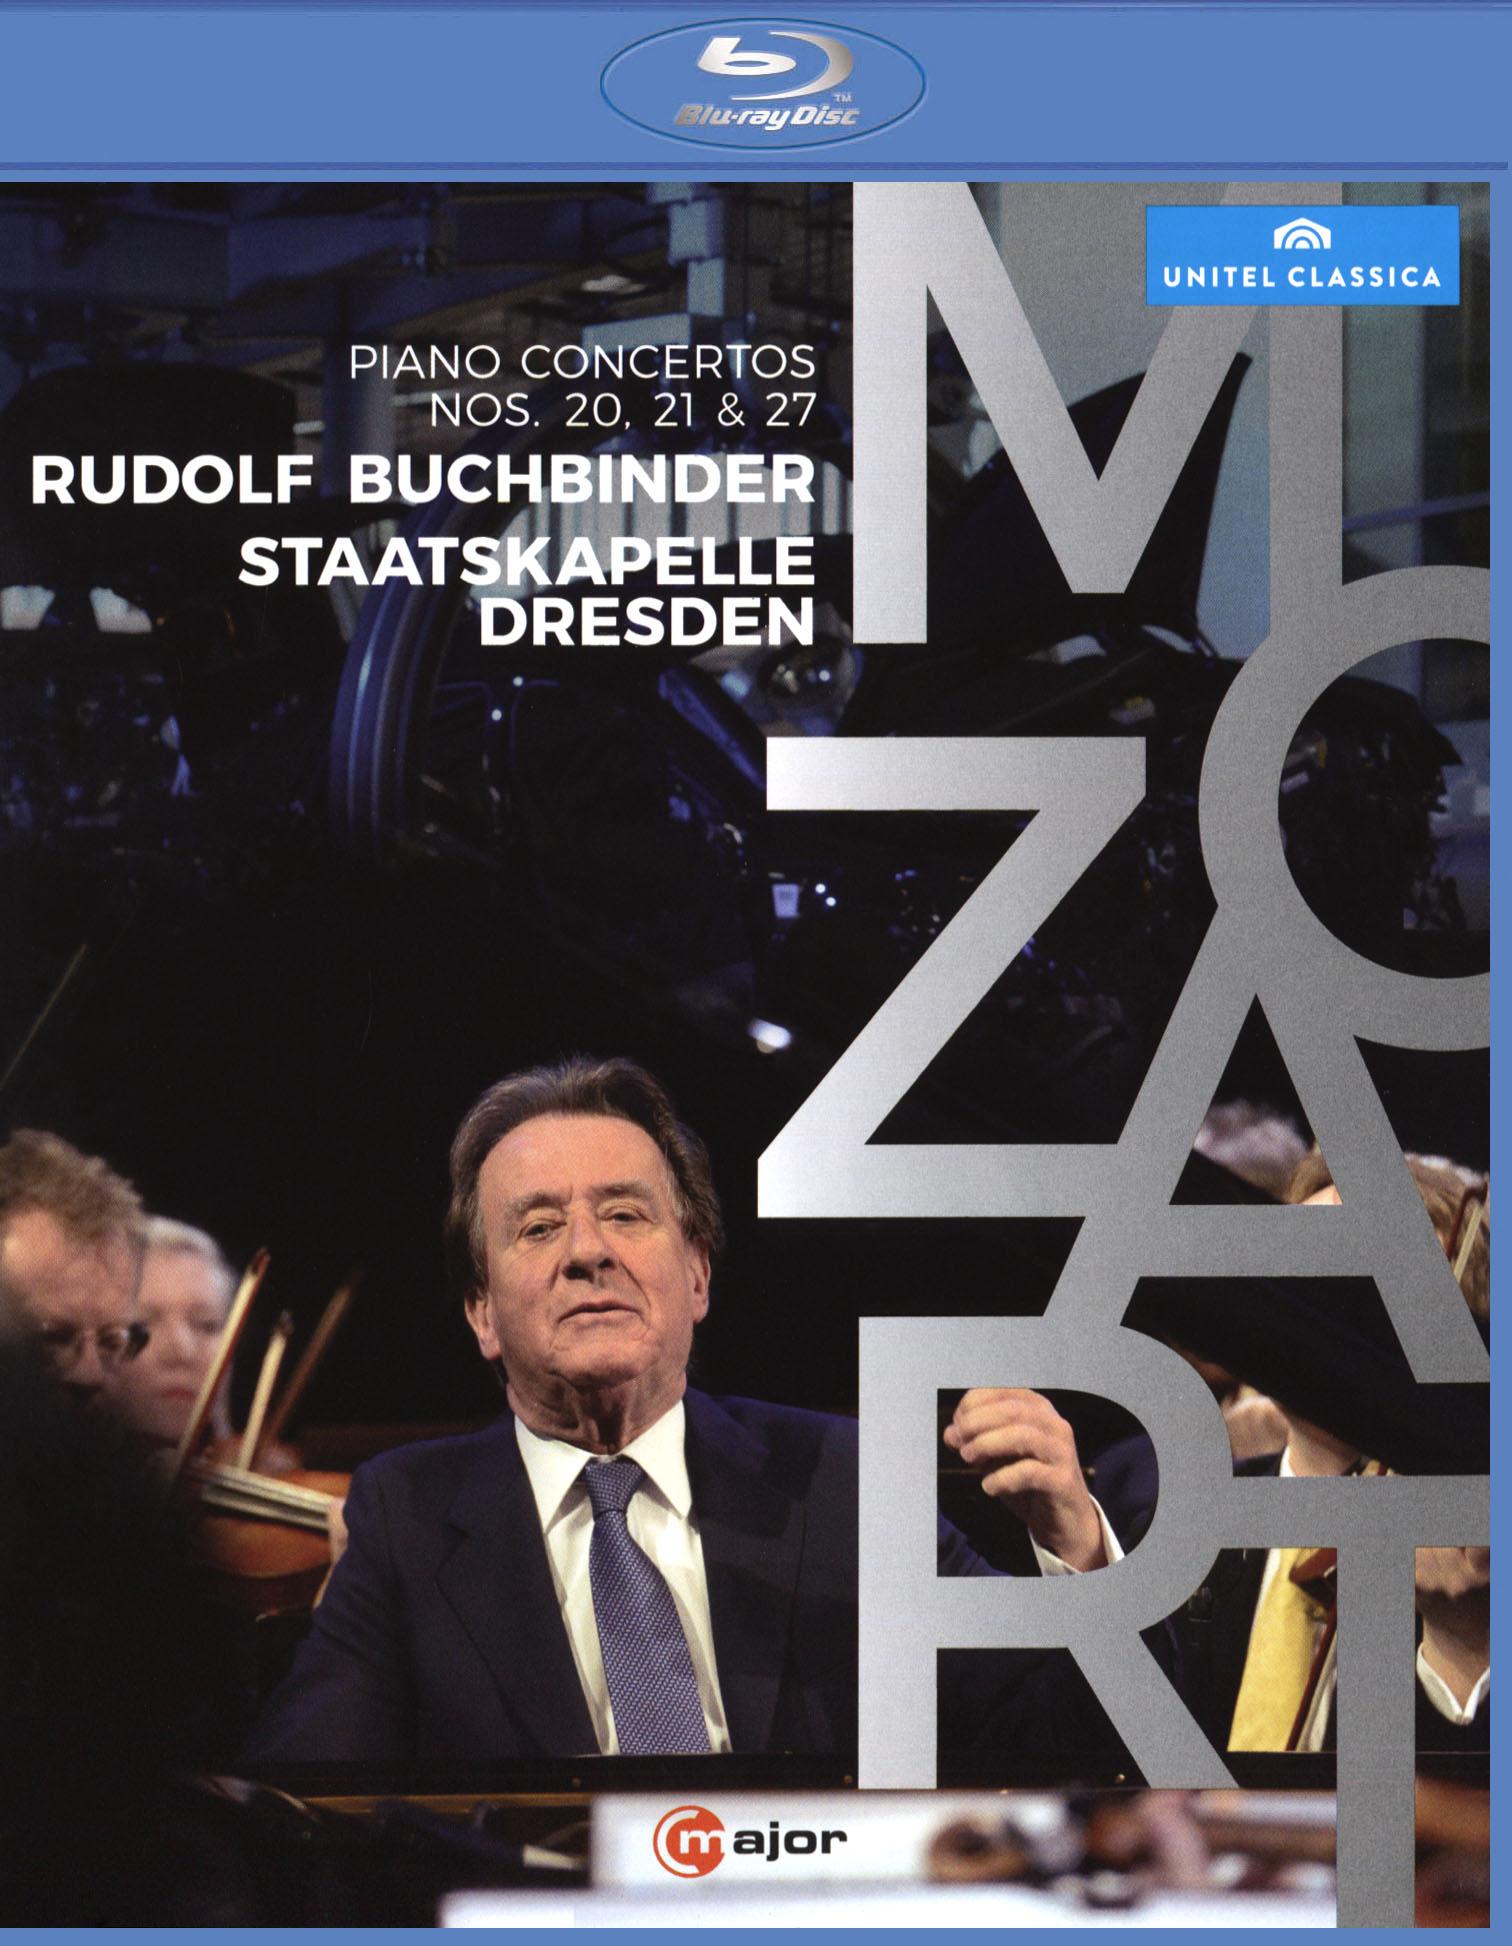 Rudolf Buchbinder/Staatskapelle Dresden: Mozart - Piano Concertos Nos. 20, 21 & 27